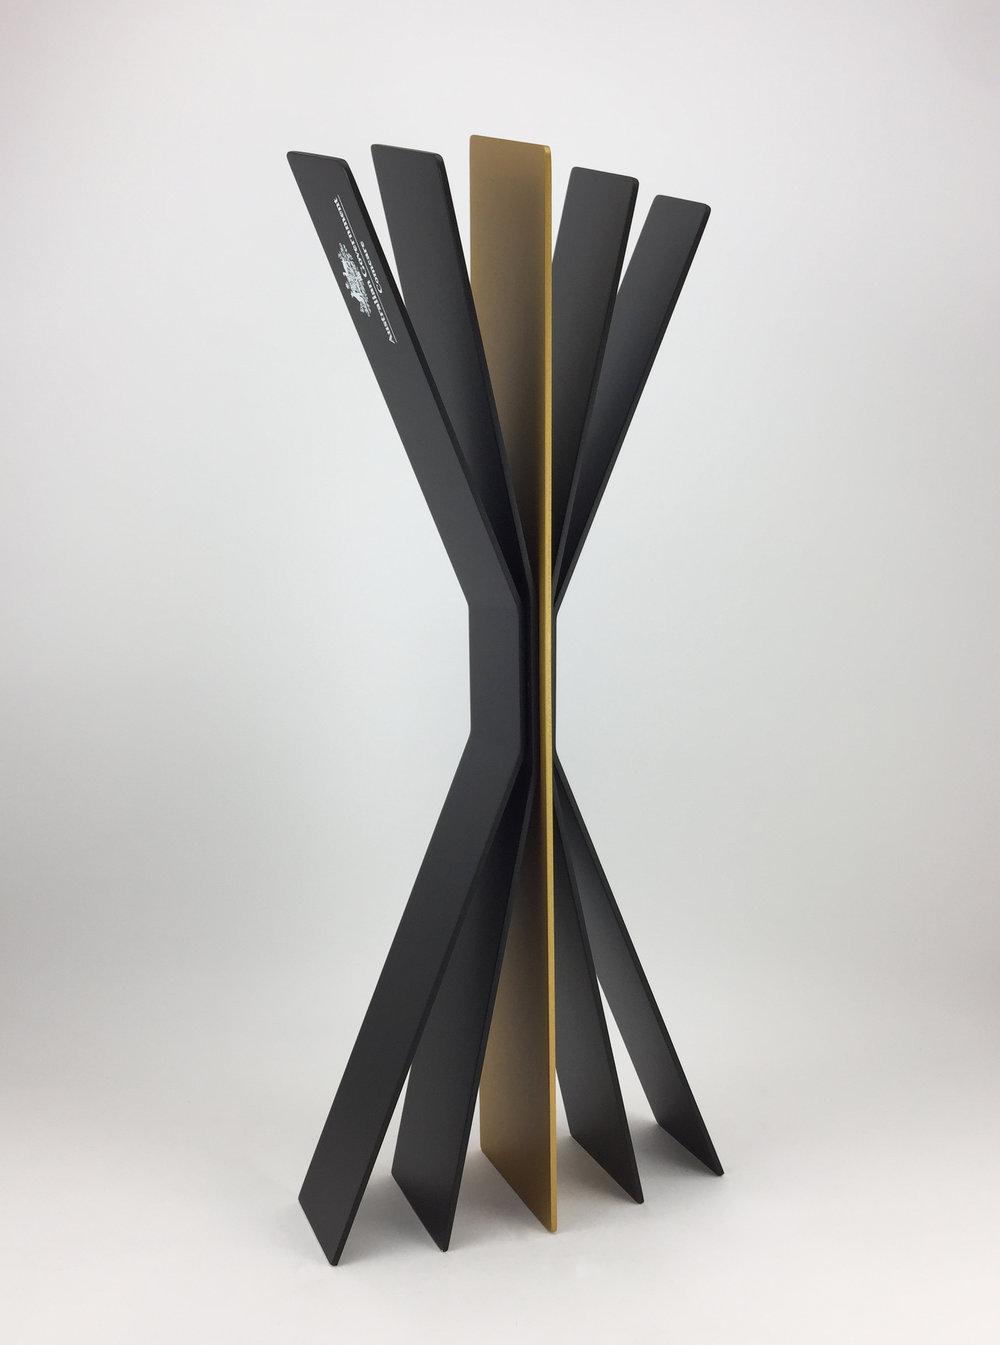 comcare-aluminium-award-trophy-06.jpg